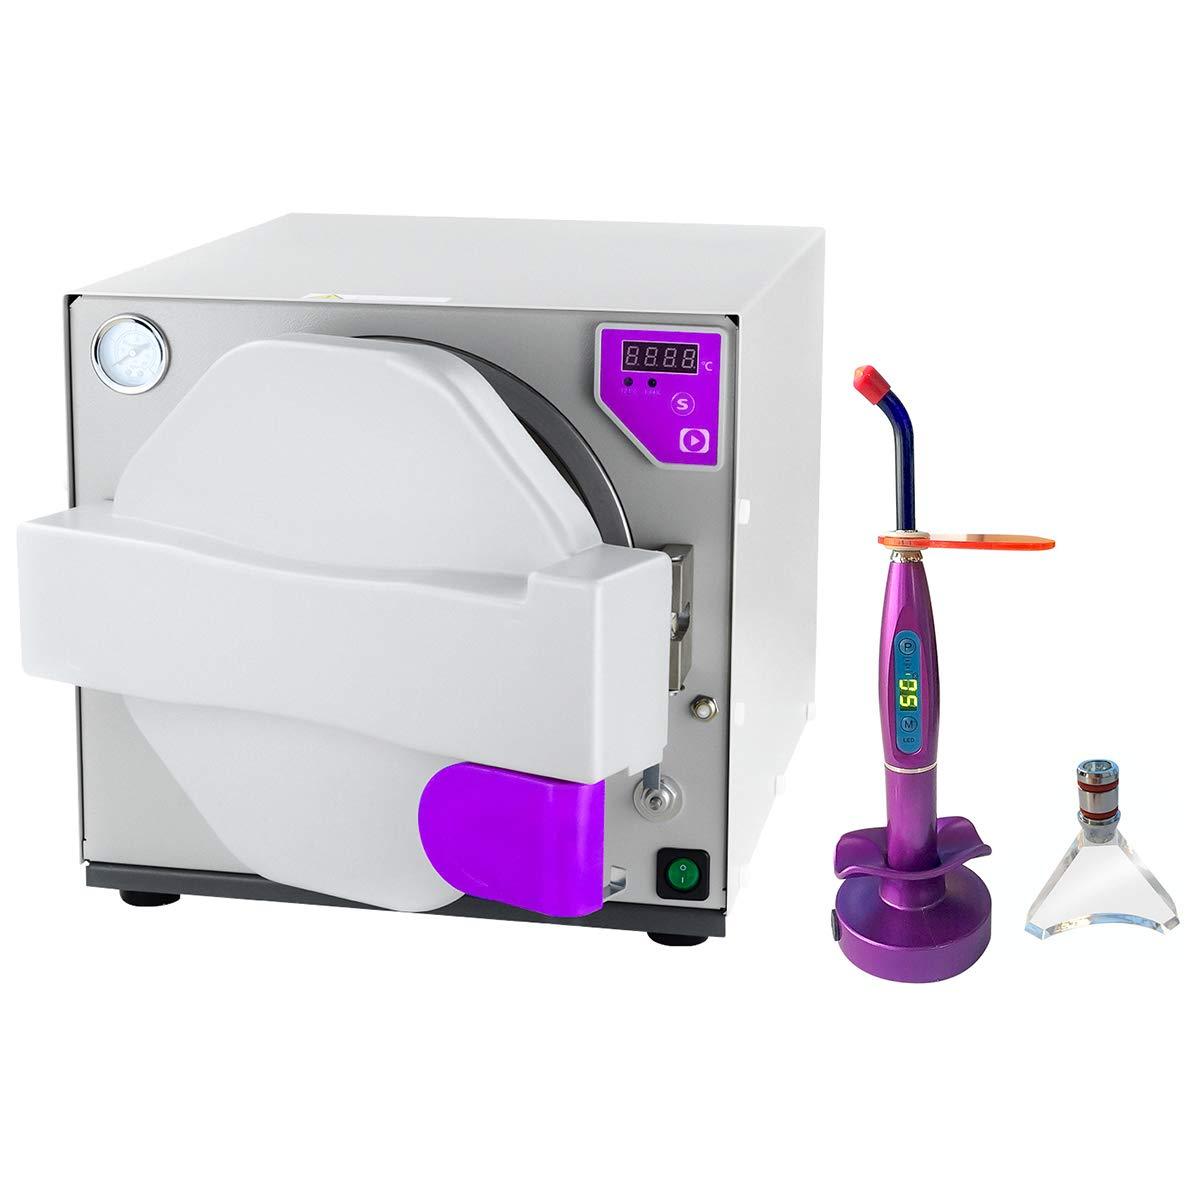 BONEW 18L Autoclave Steam Dental Lab Equipment Tool Mini330 by BONEW (Image #1)